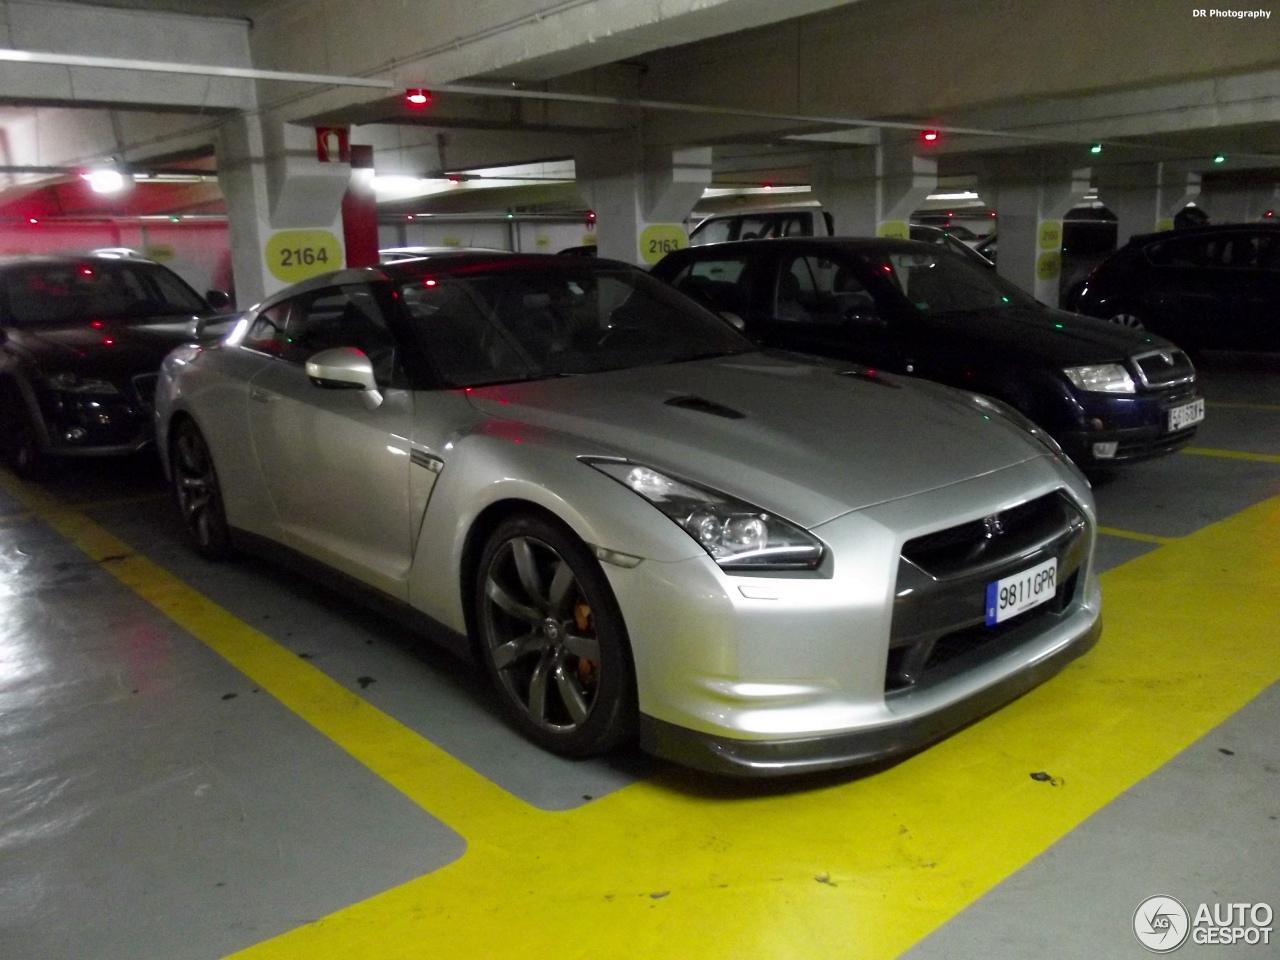 Nissan Gt R 16 Enero 2013 Autogespot